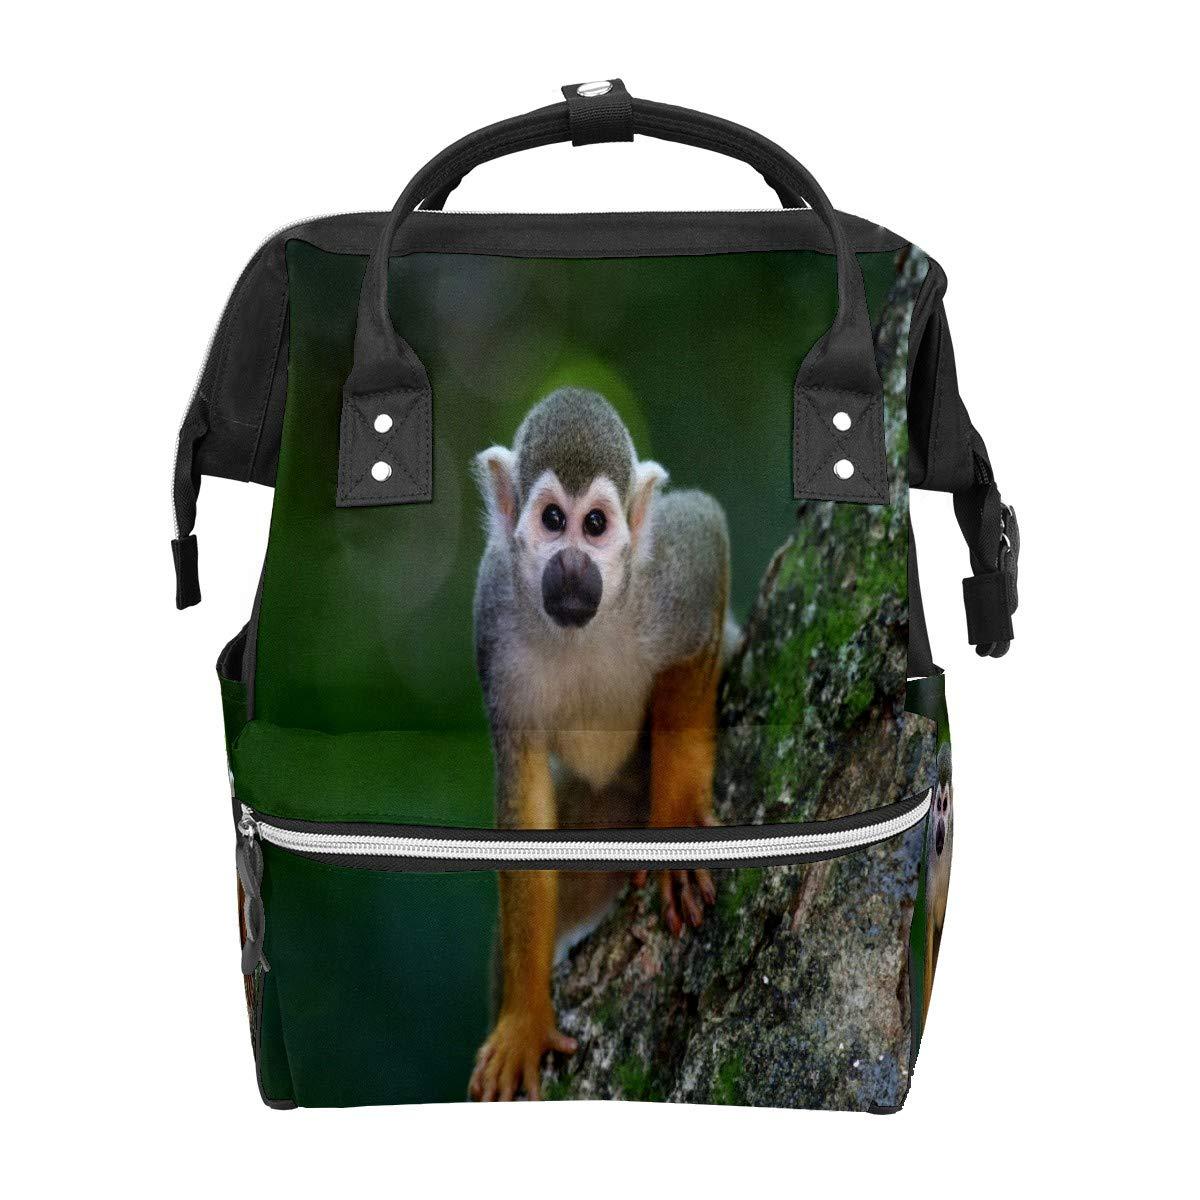 Diaper Bag Backpack Monkey Ape Mammal Looking Multifunction Travel Back Pack Baby Changing Bags Large Capacity Waterproof Stylish